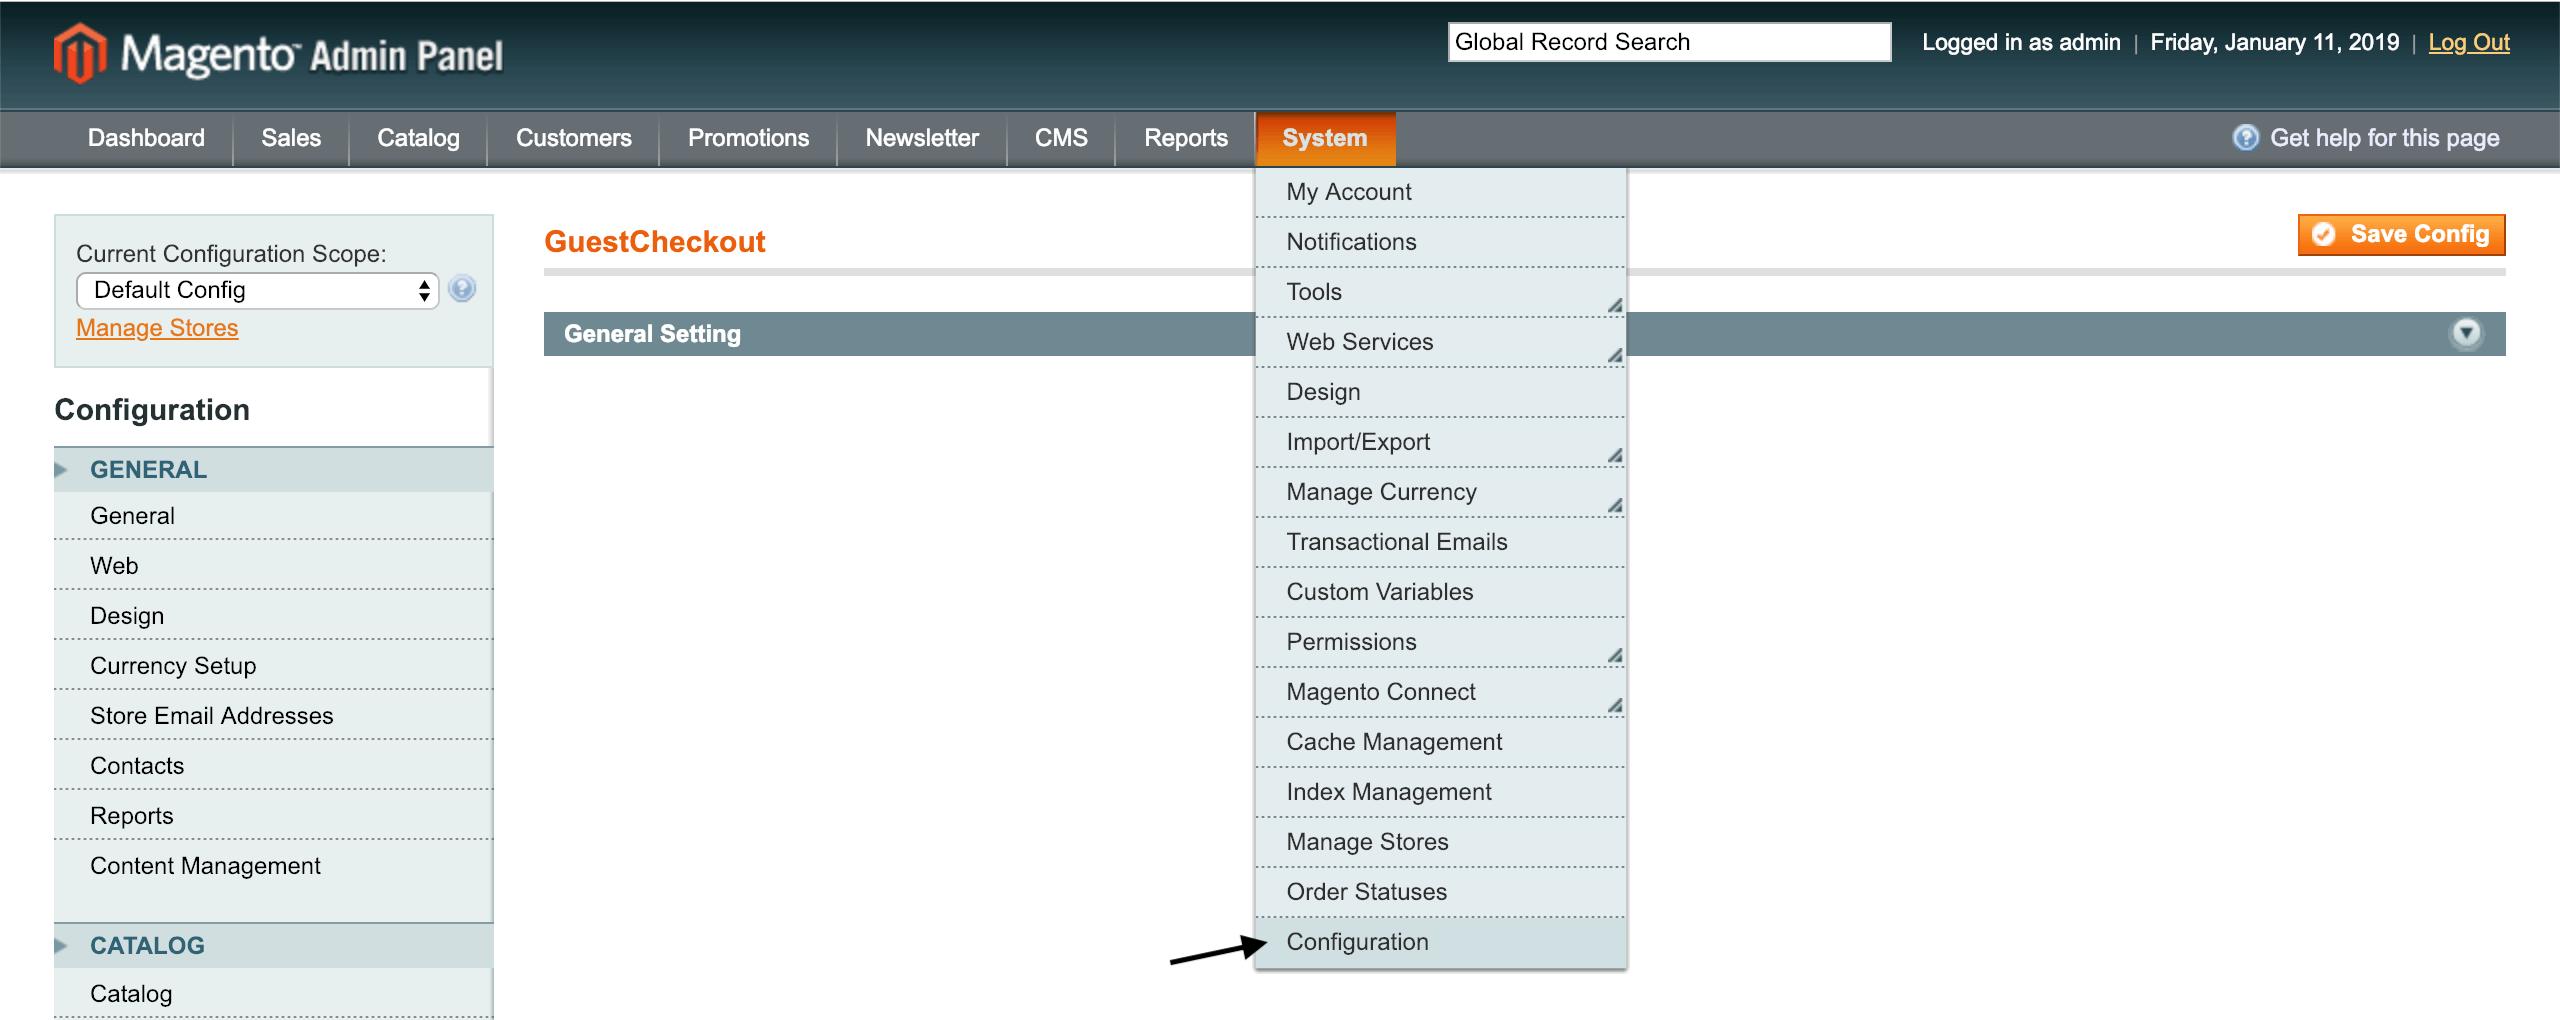 iubenda Cookie Solution for Magento 1.9.x